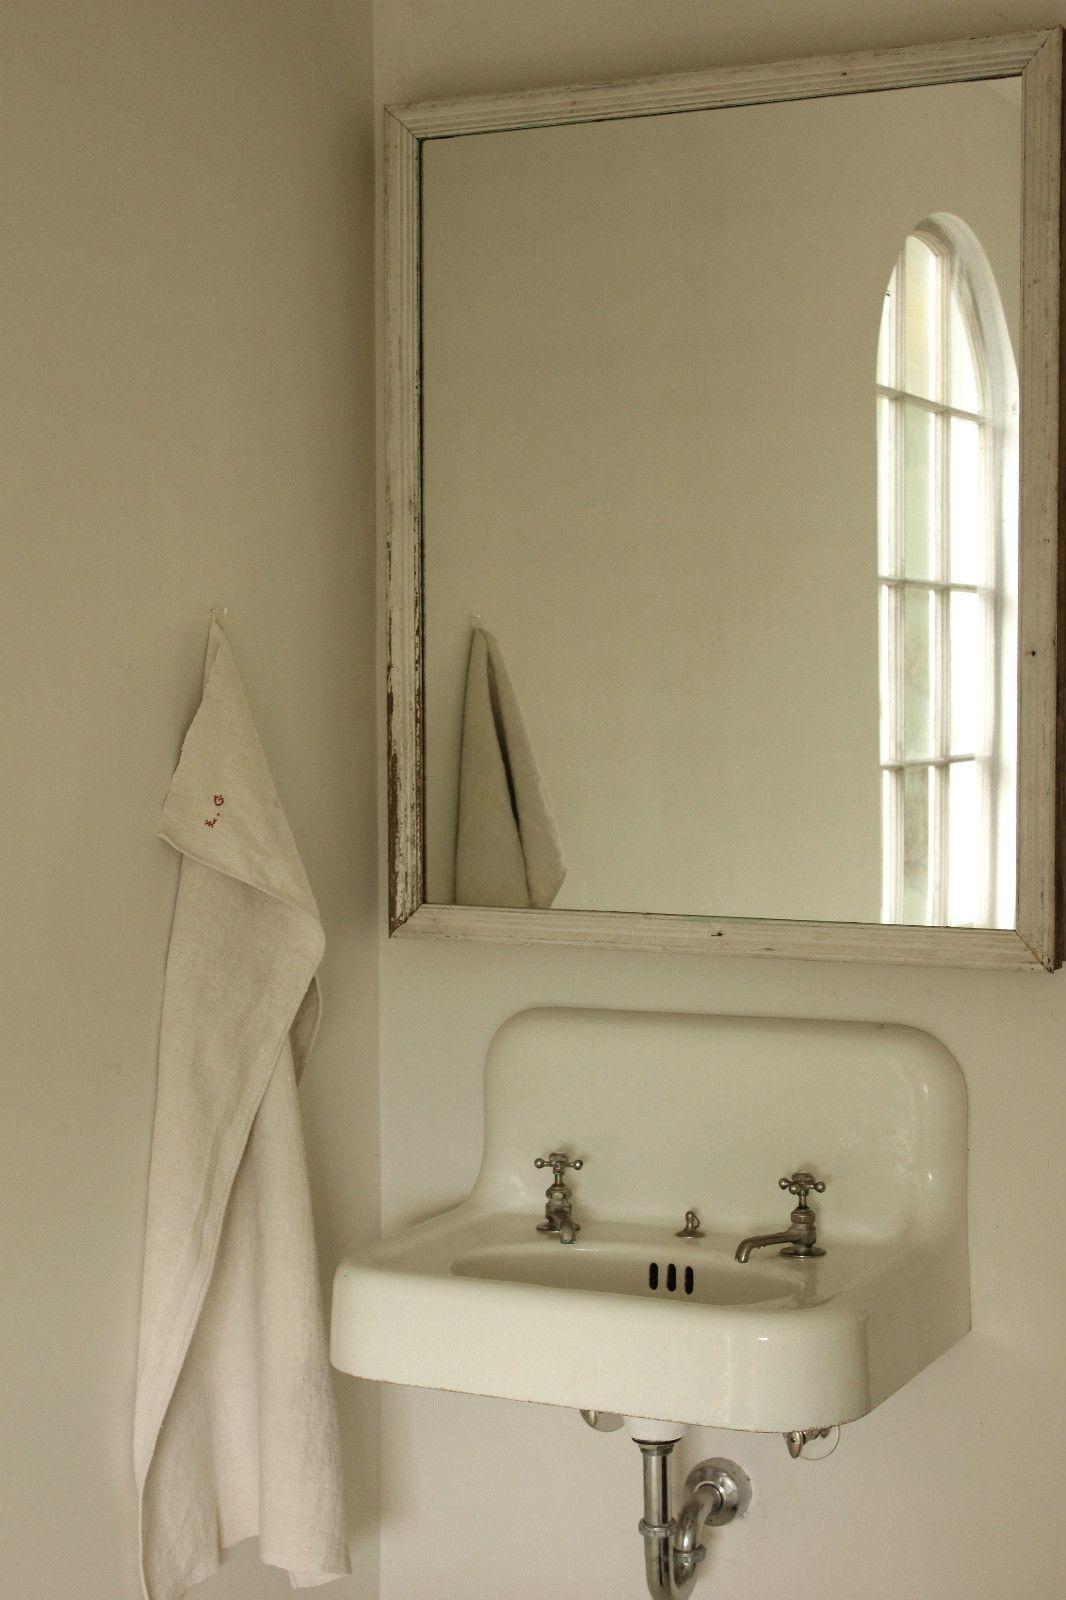 Bathroom Plumbing 101 Interior laszlo plumbing of phoenix az 602-291-6500 | 101 plumbing ideas